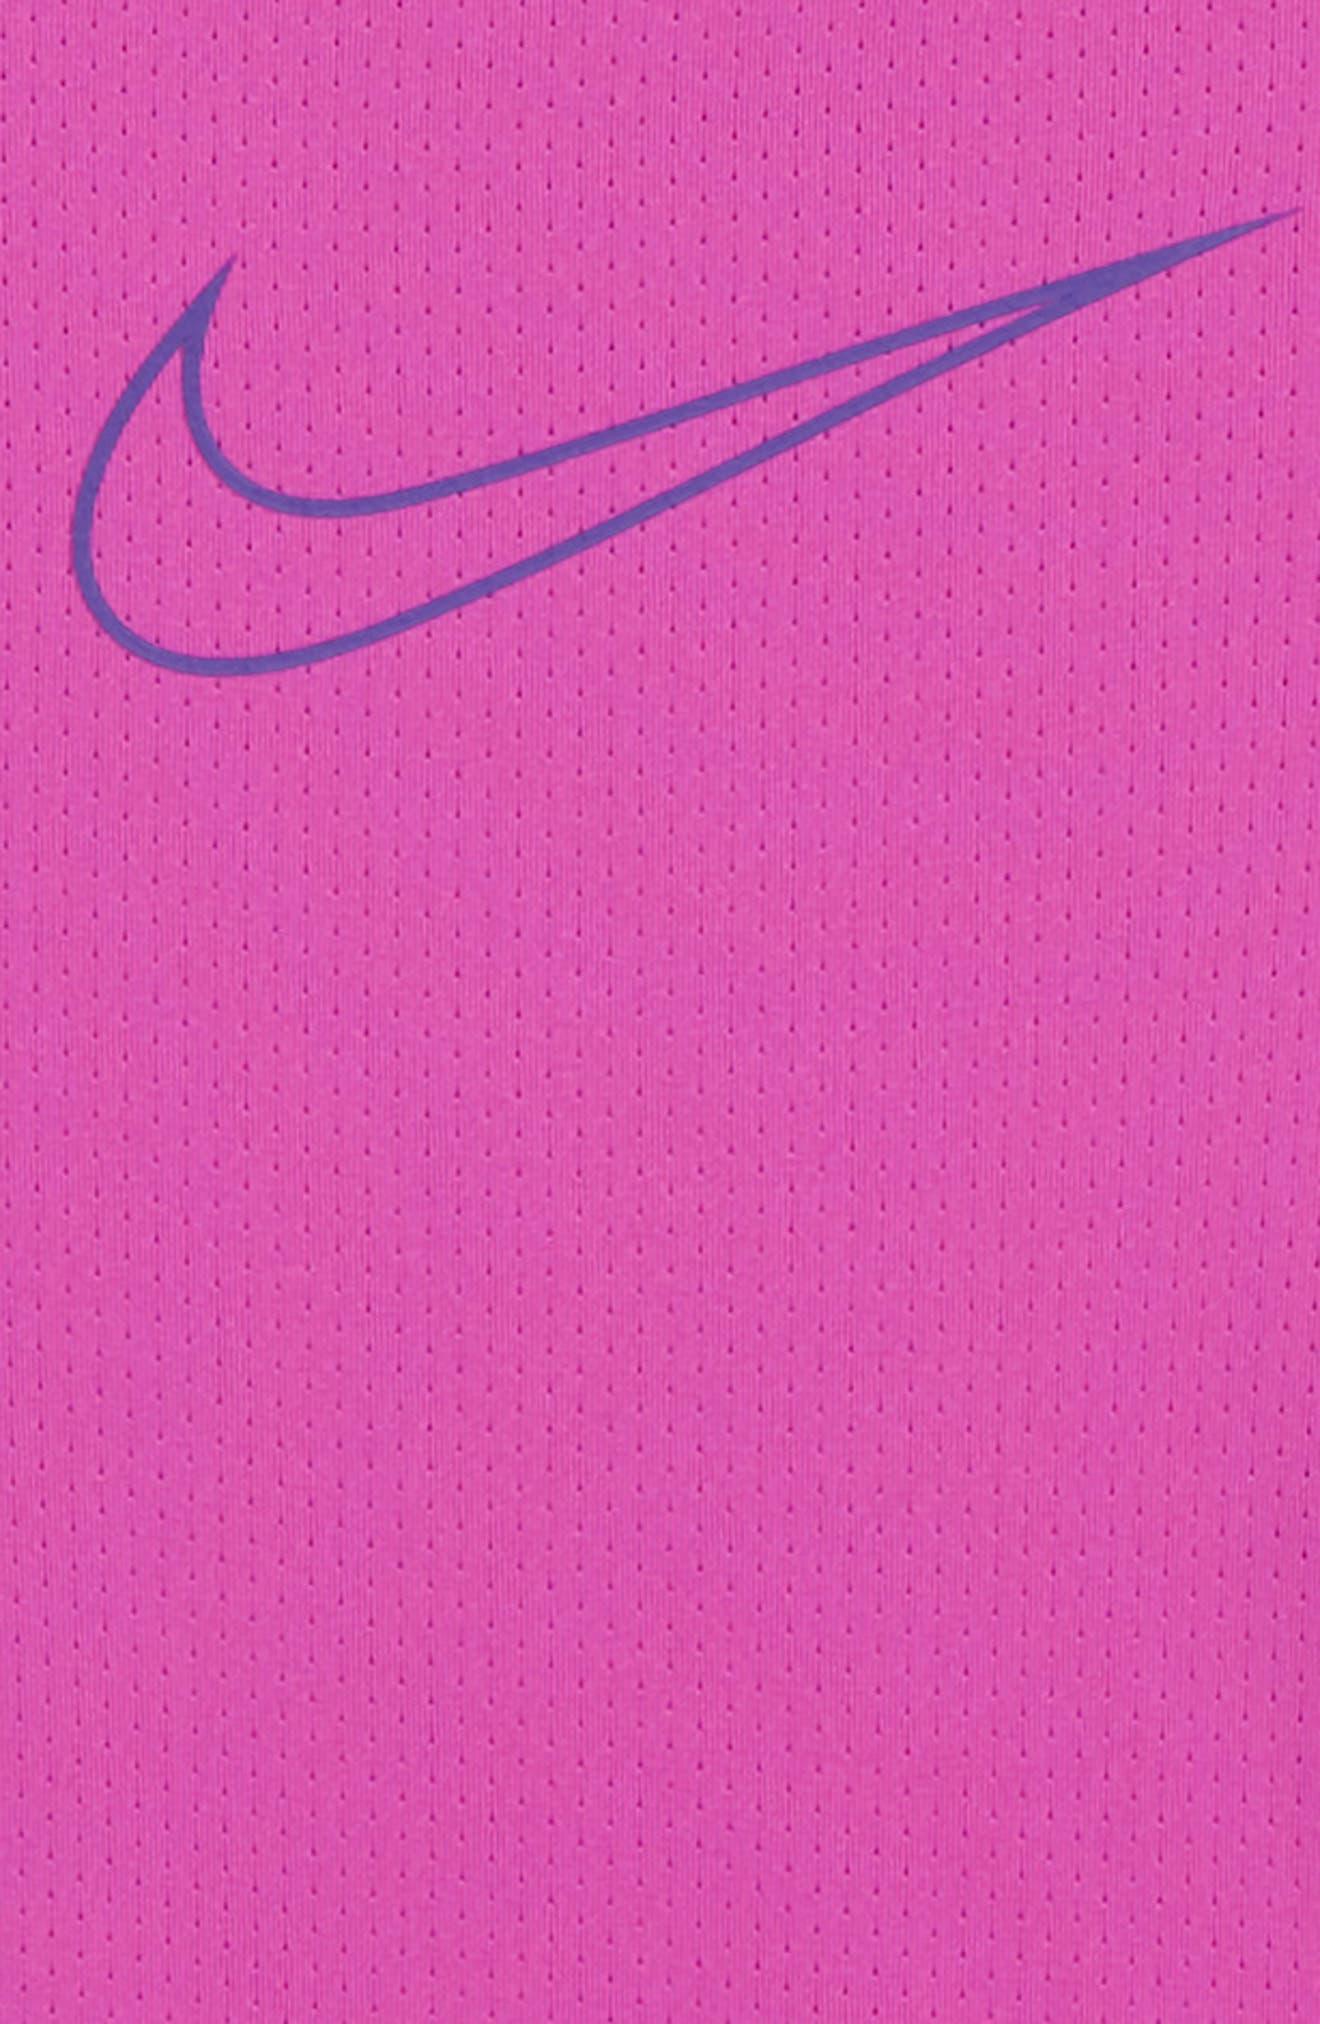 Graphic Top,                             Alternate thumbnail 2, color,                             Hyper Magenta/ Fusion Violet